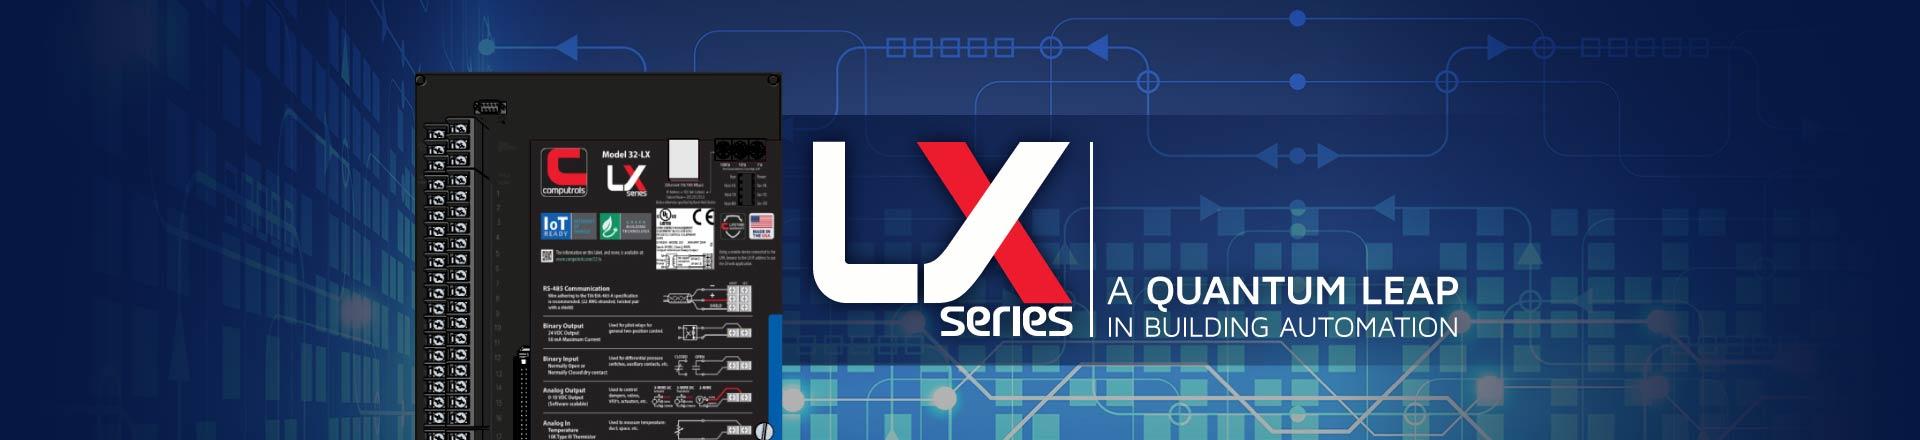 LX Series